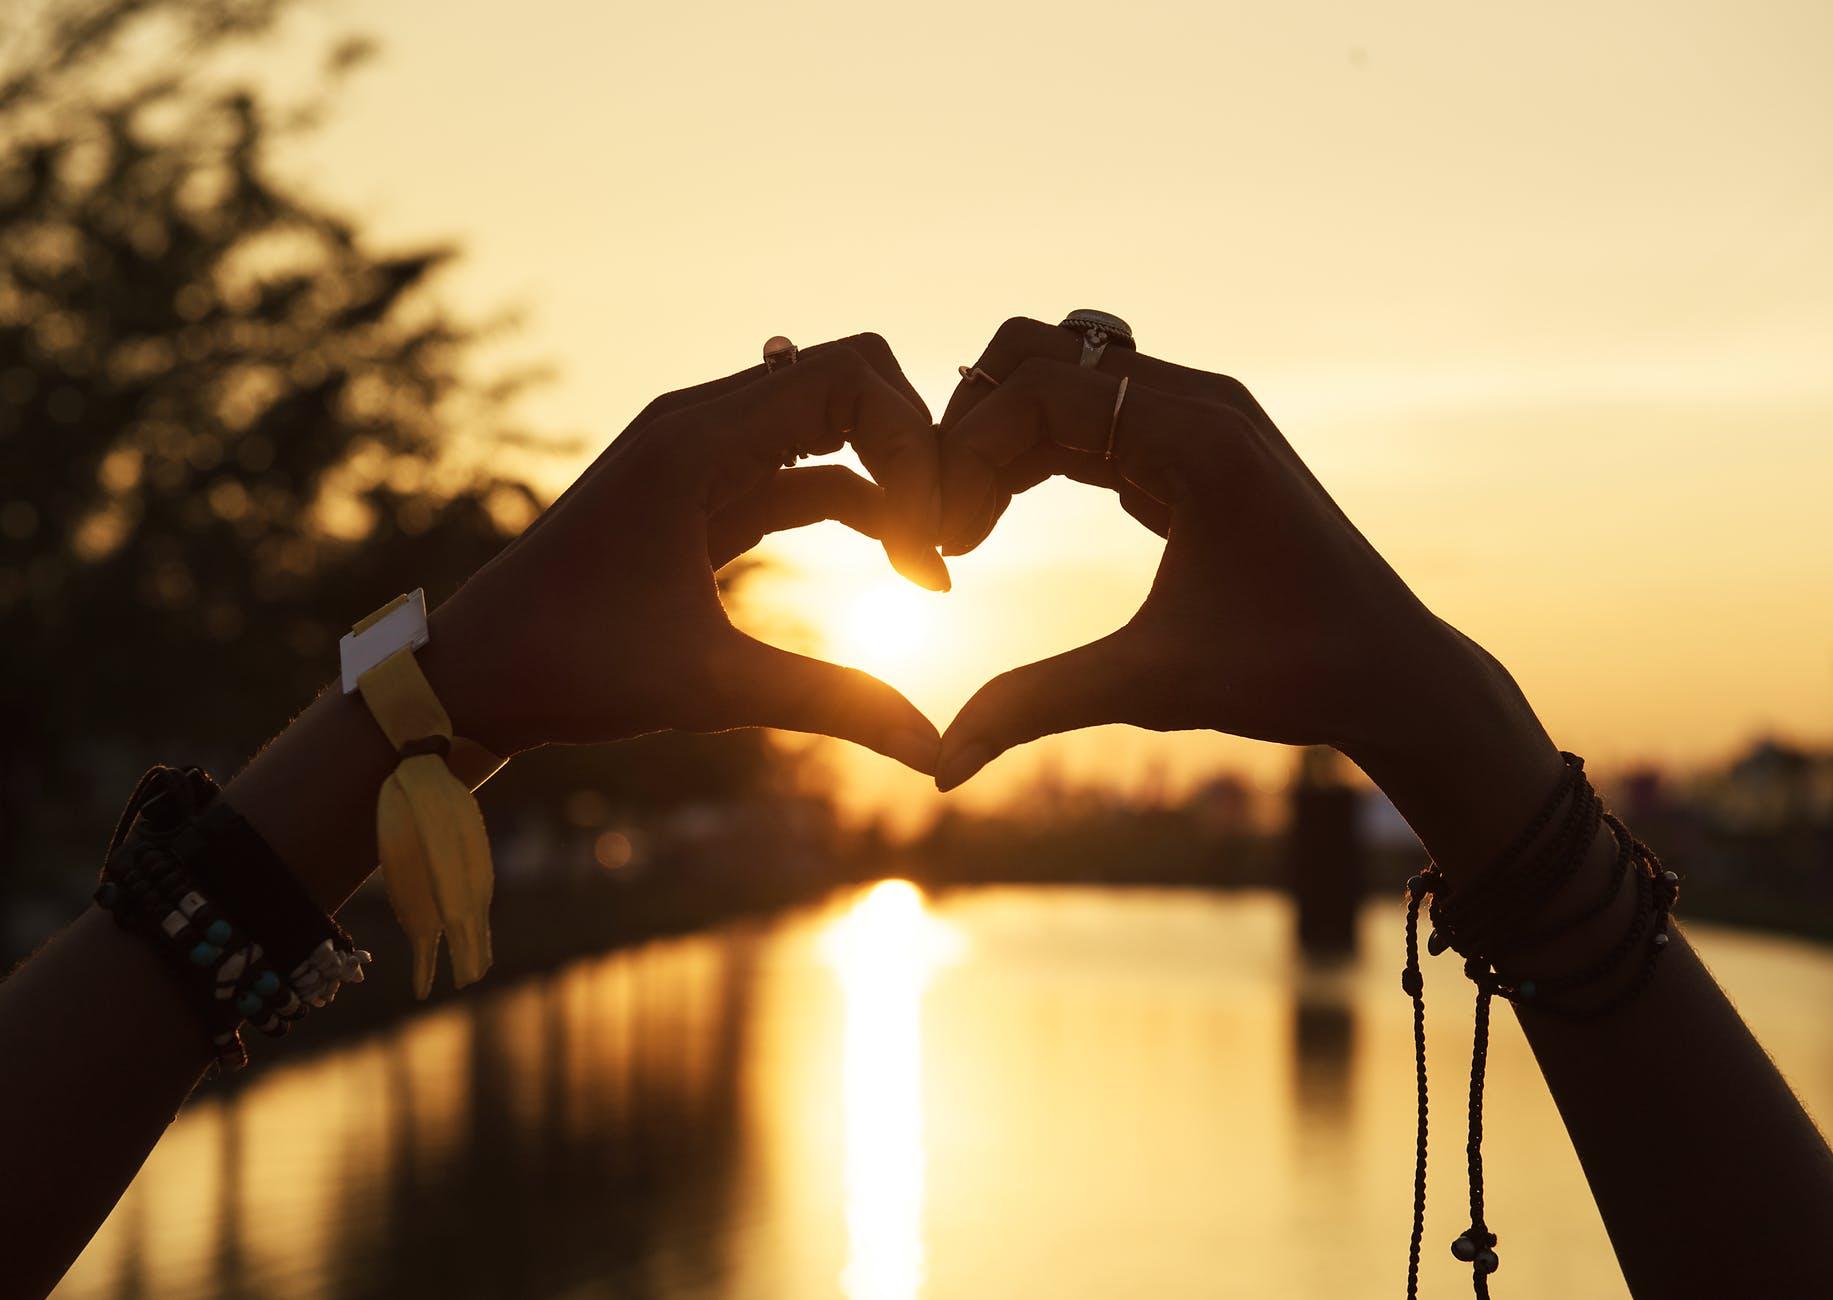 bracelets dawn dusk friendship